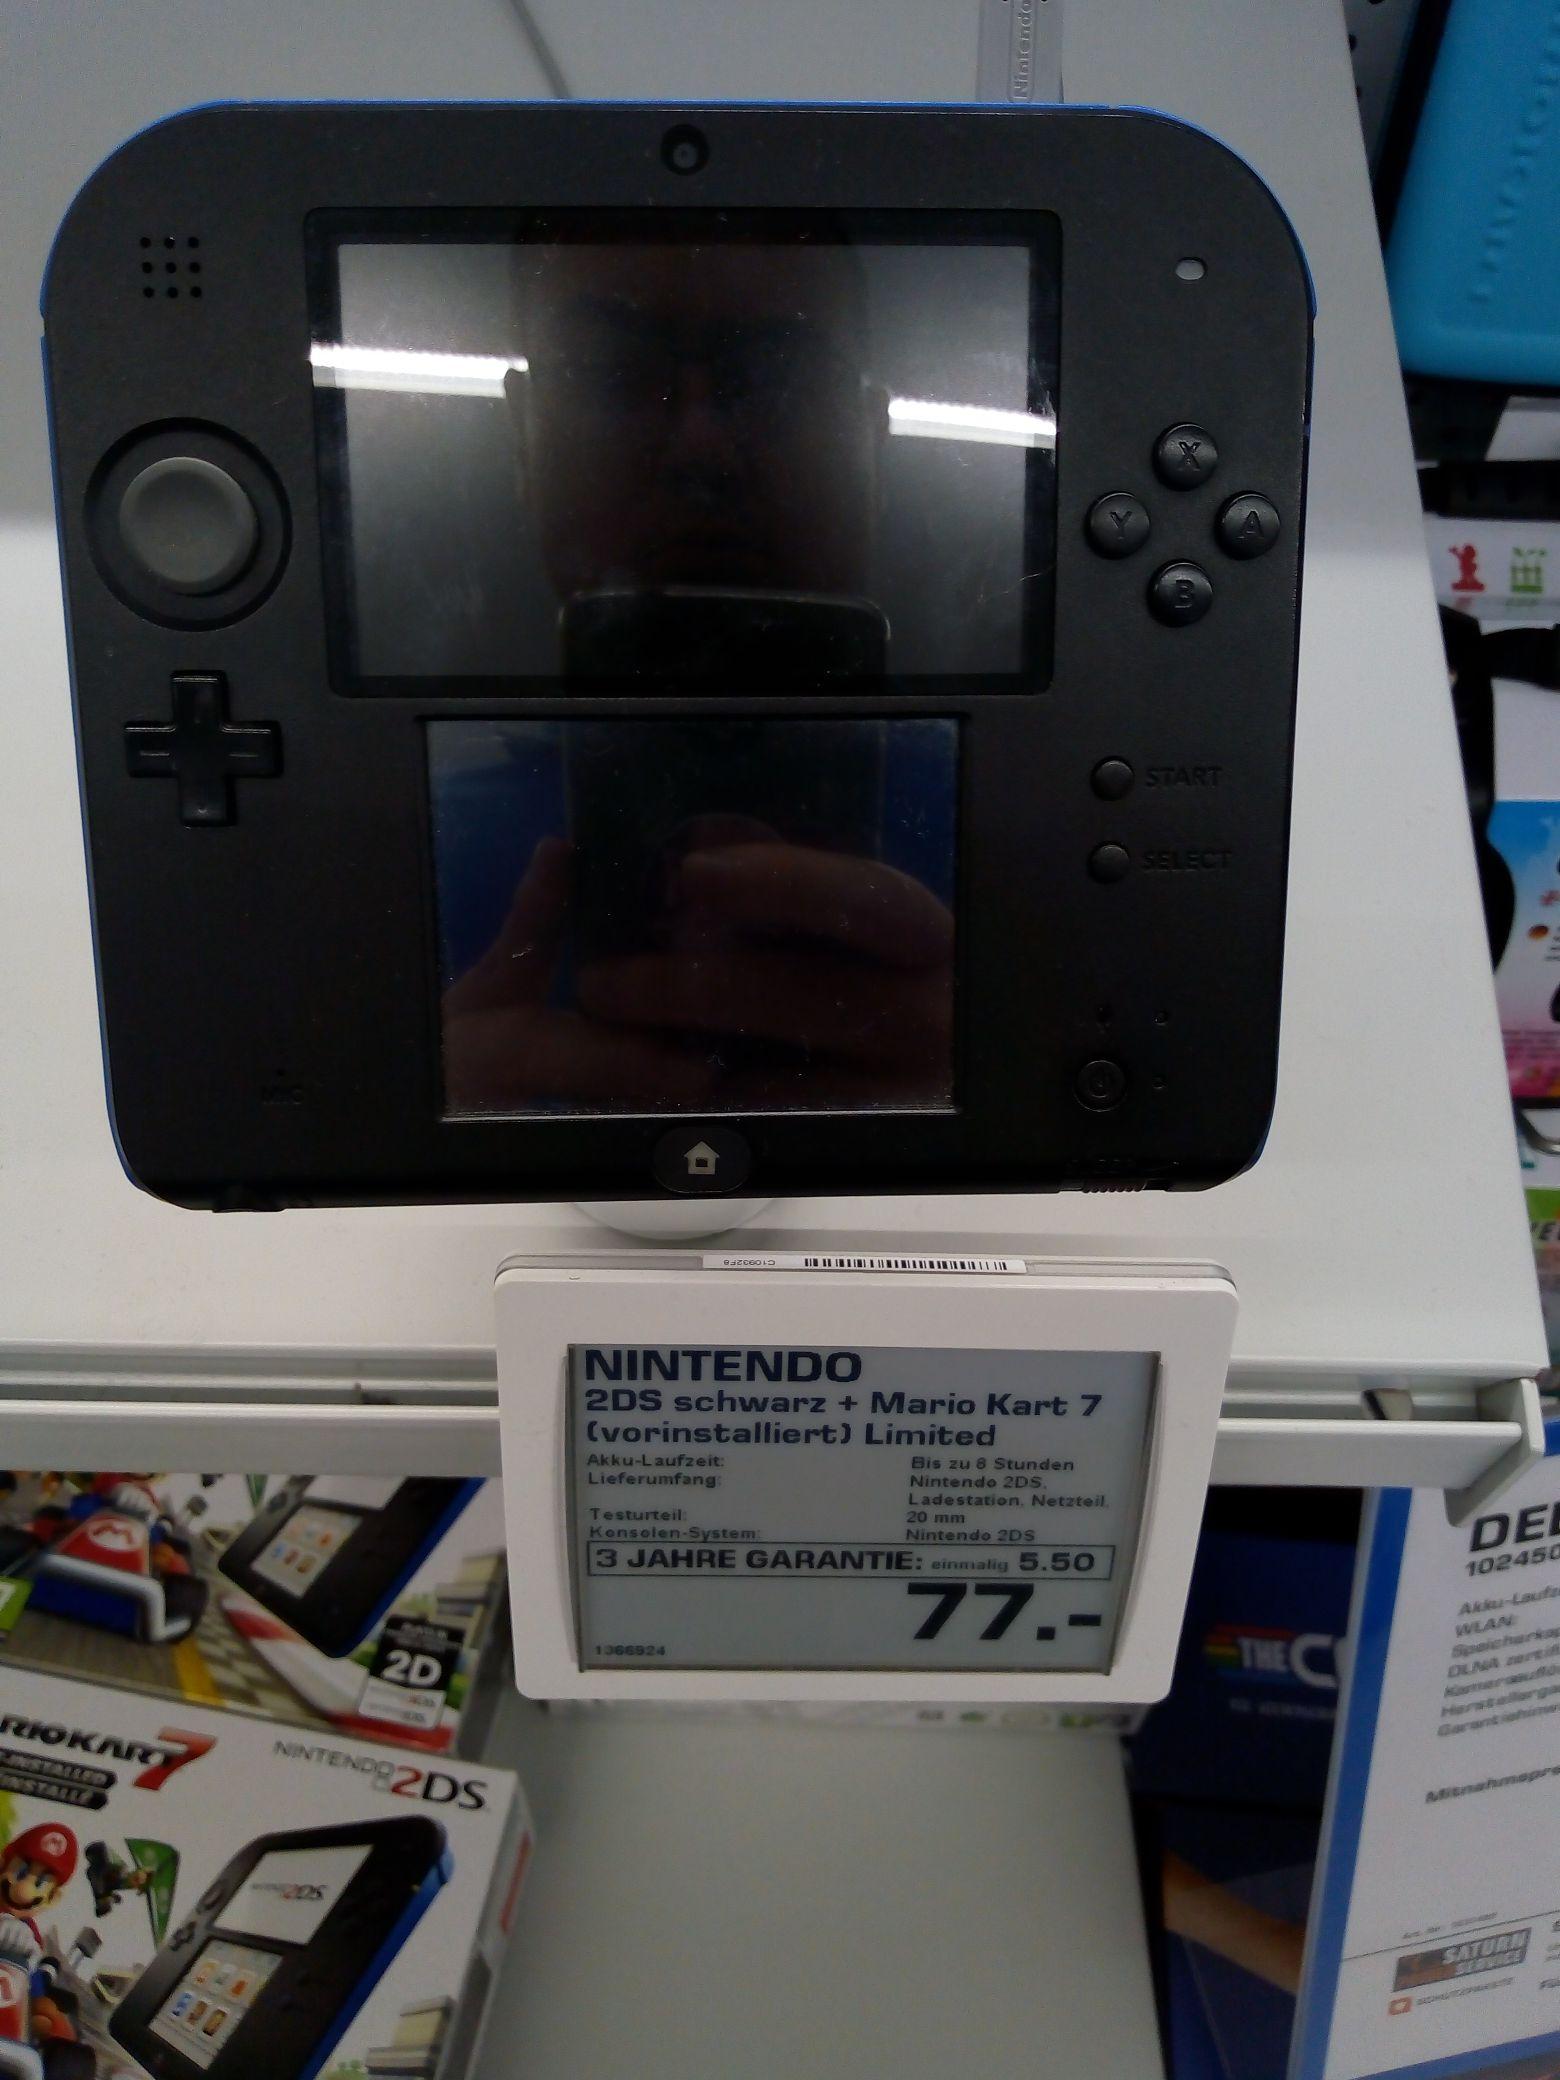 [Saturn Linz] Nintendo 2DS Konsole plus Mario Kart 7